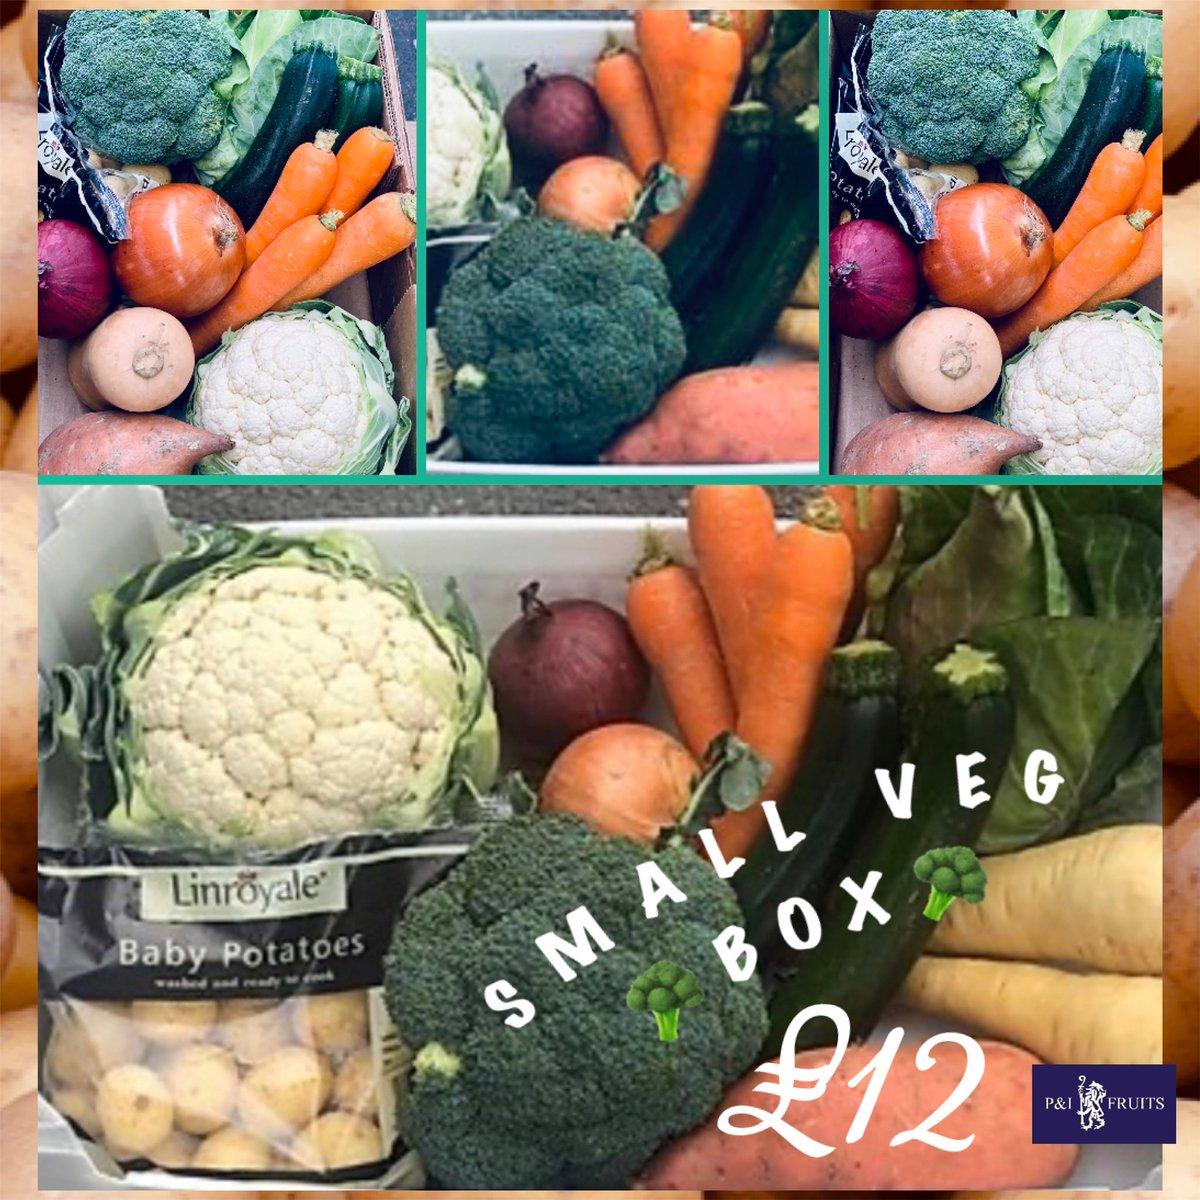 The Veg Box Large or Small 🥦🥕🥔#vegboxes #fruitboxes #servingduringcovid19 #servingthepublic https://t.co/SbjH7FmlfP